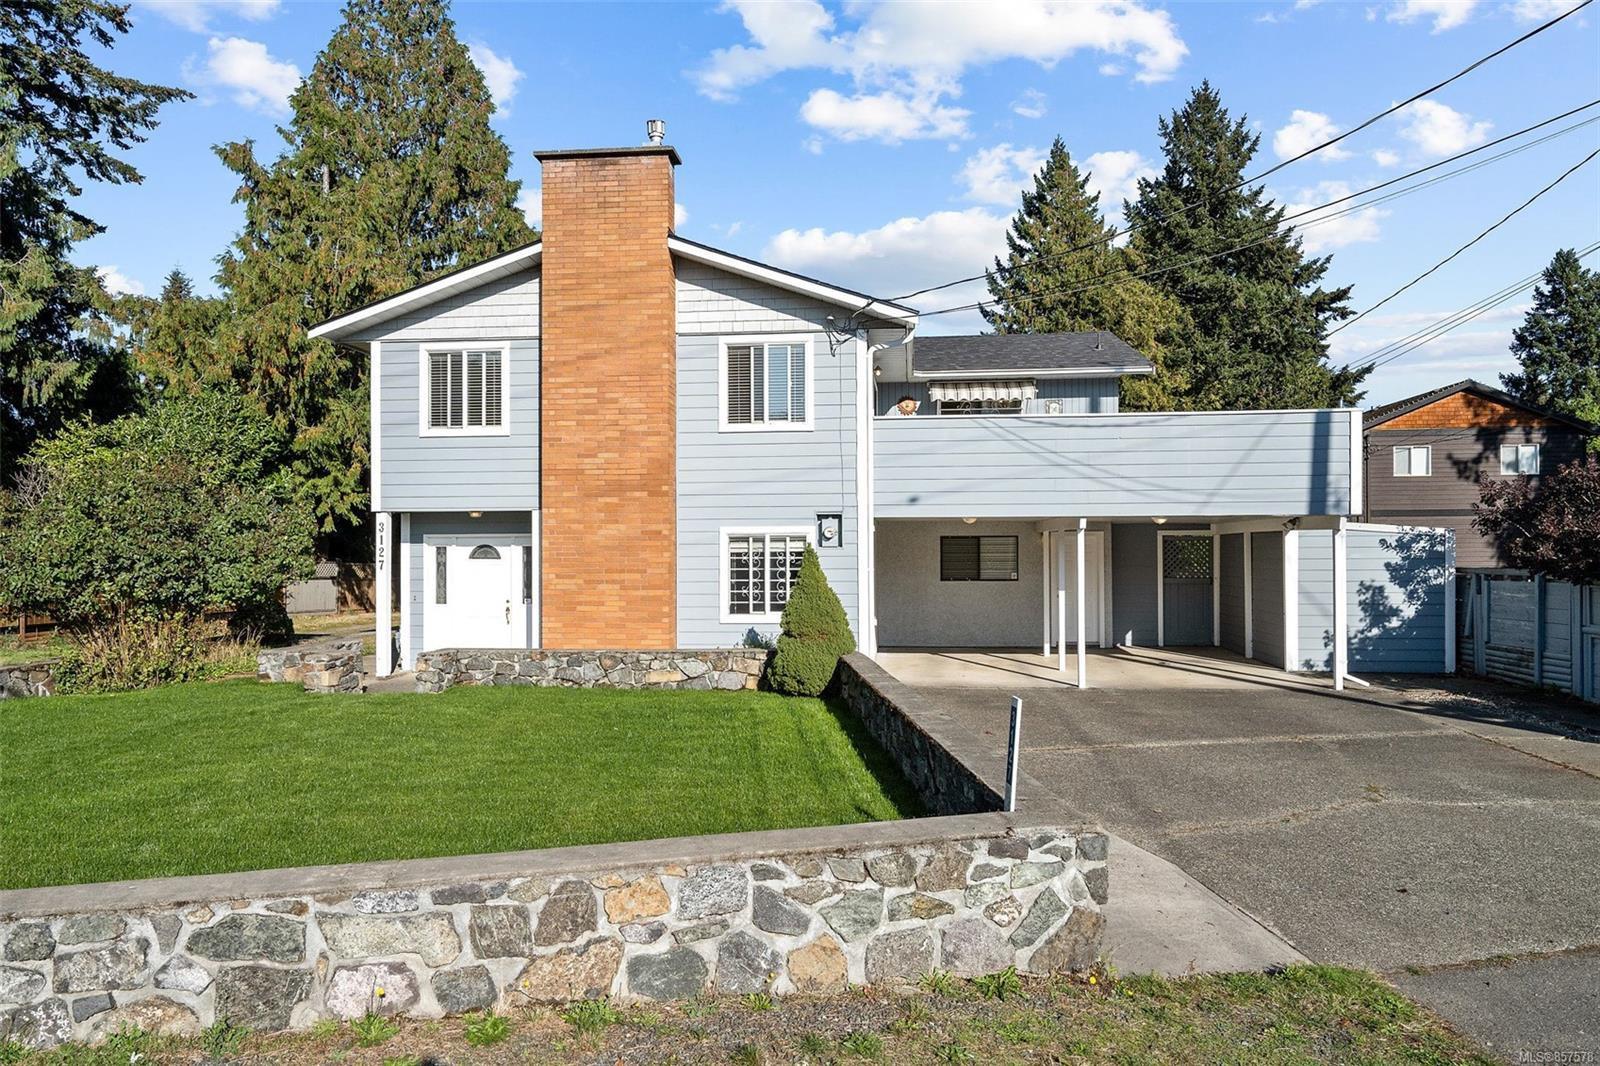 Main Photo: 3127 Glen Lake Rd in : La Glen Lake House for sale (Langford)  : MLS®# 857578